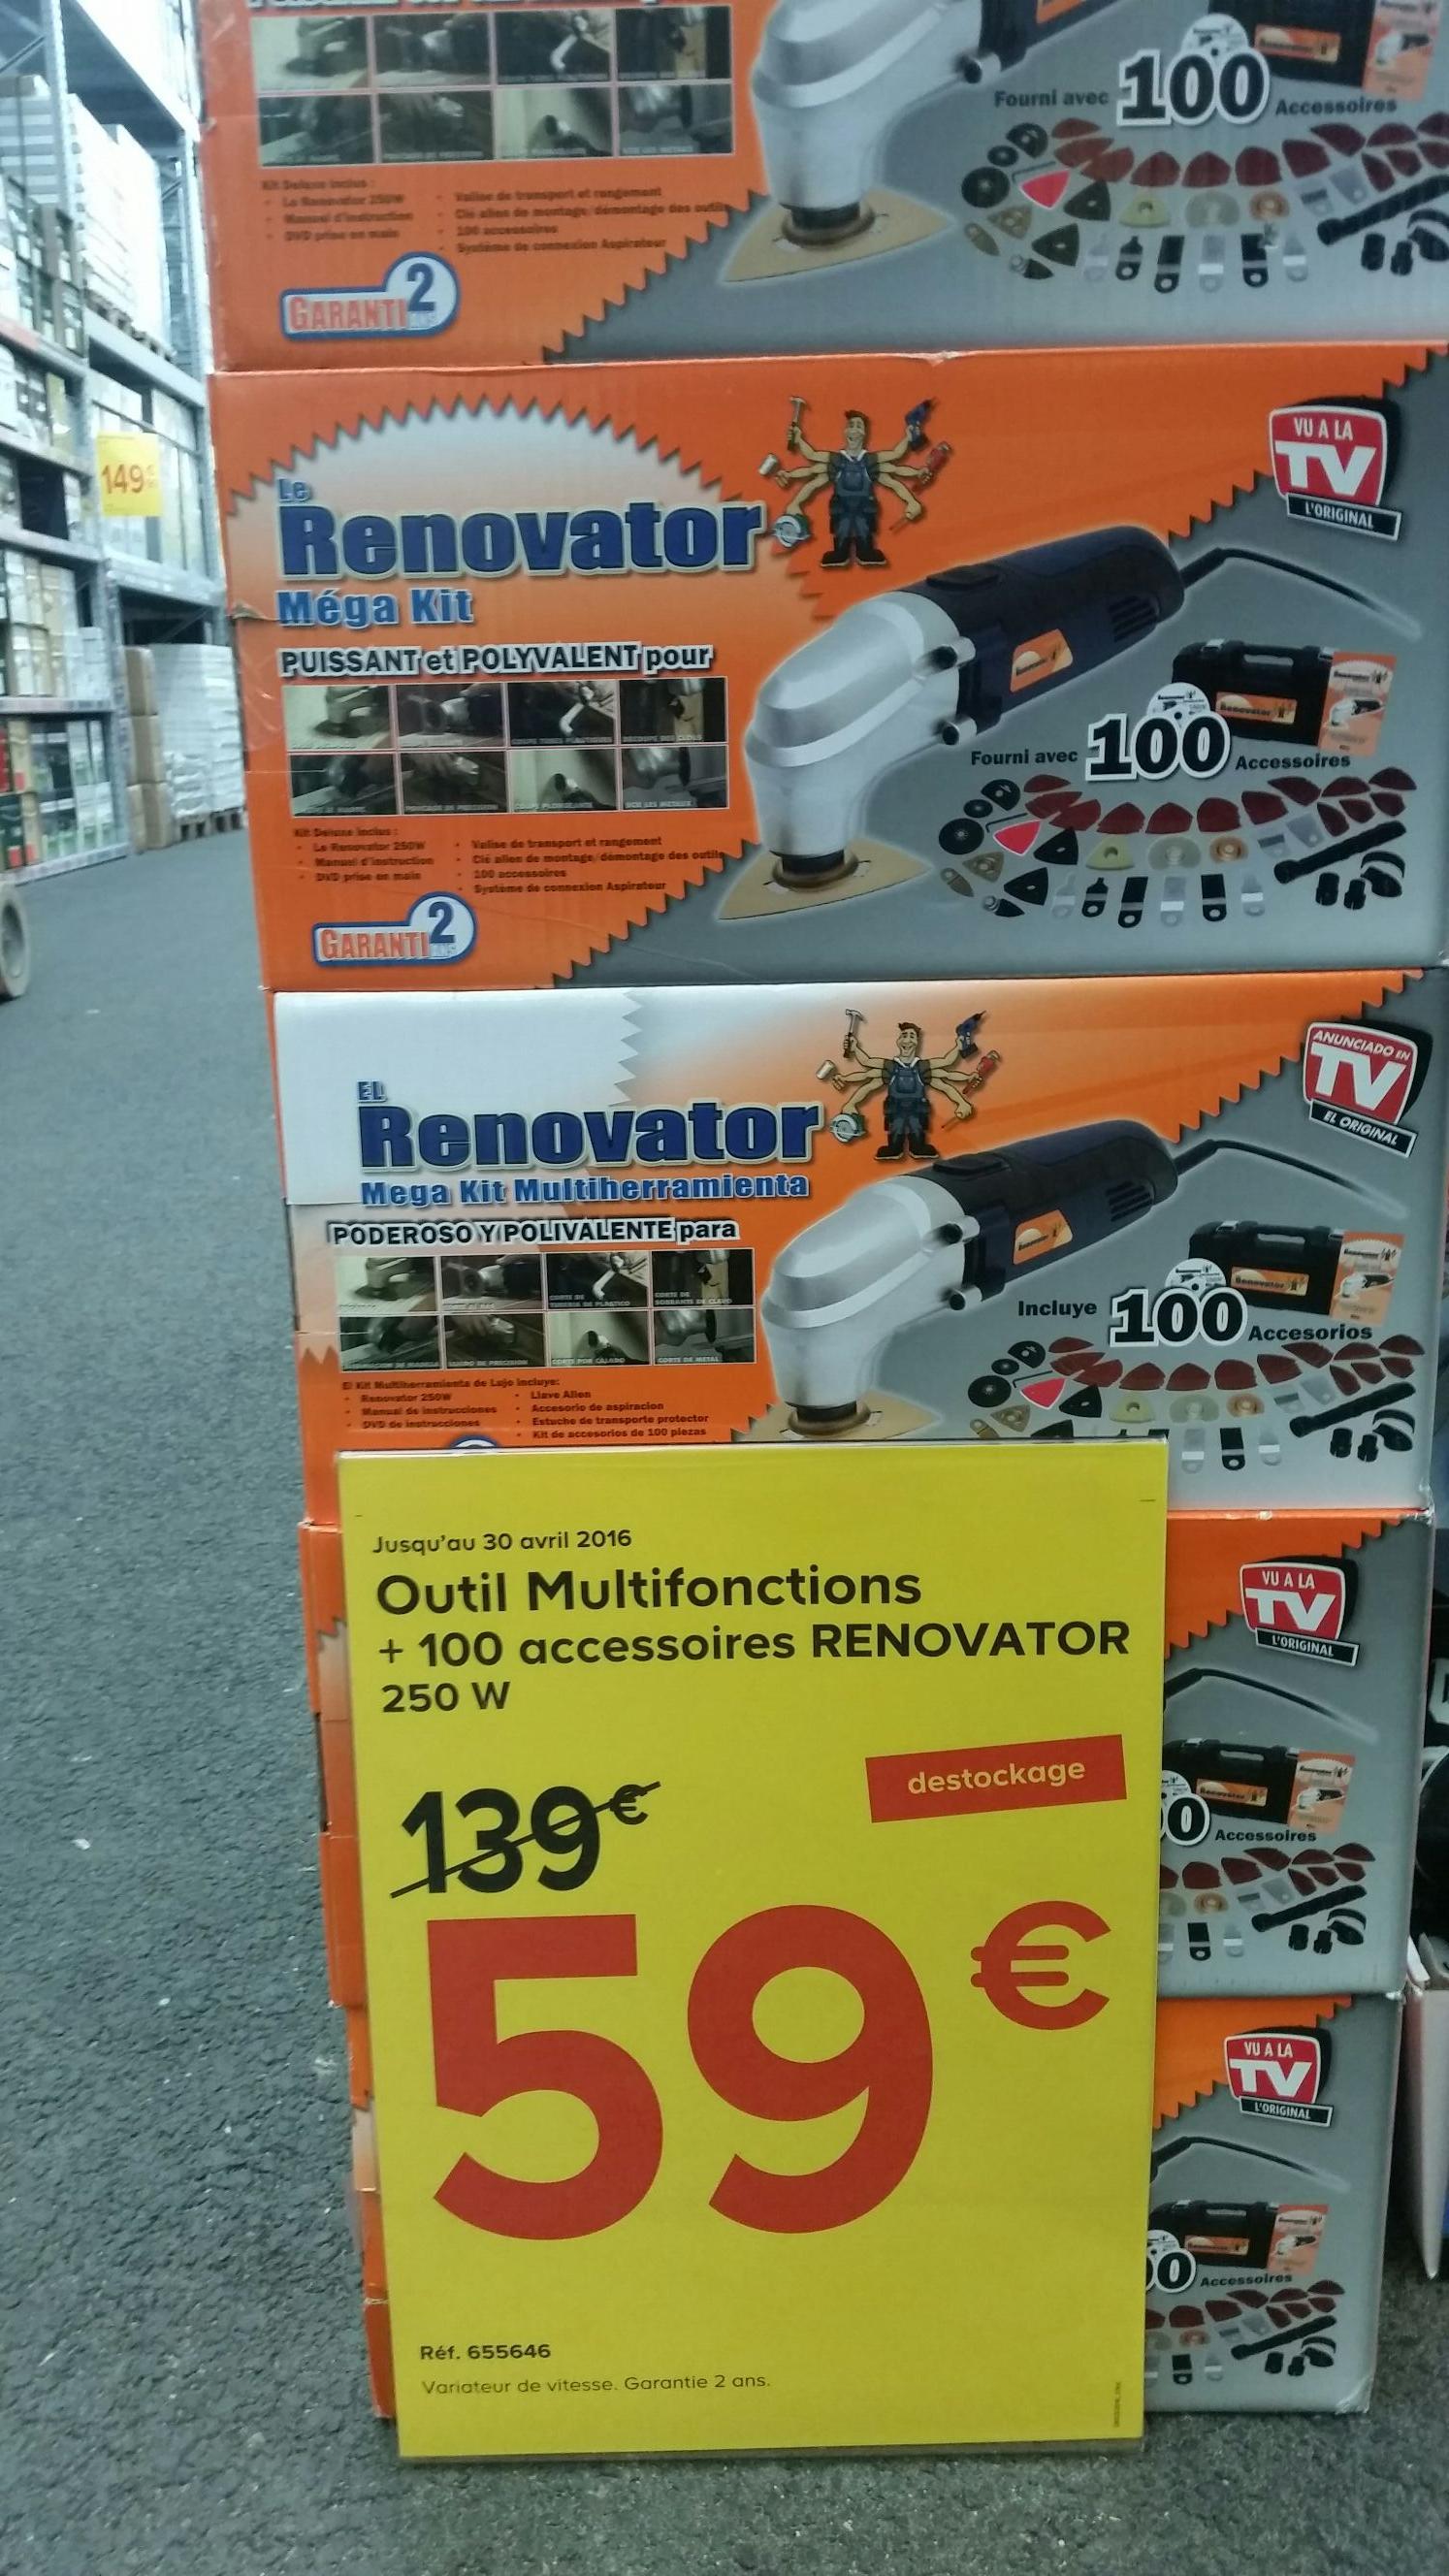 Outil Multifonctions Renovator 250w + 100 accessoires